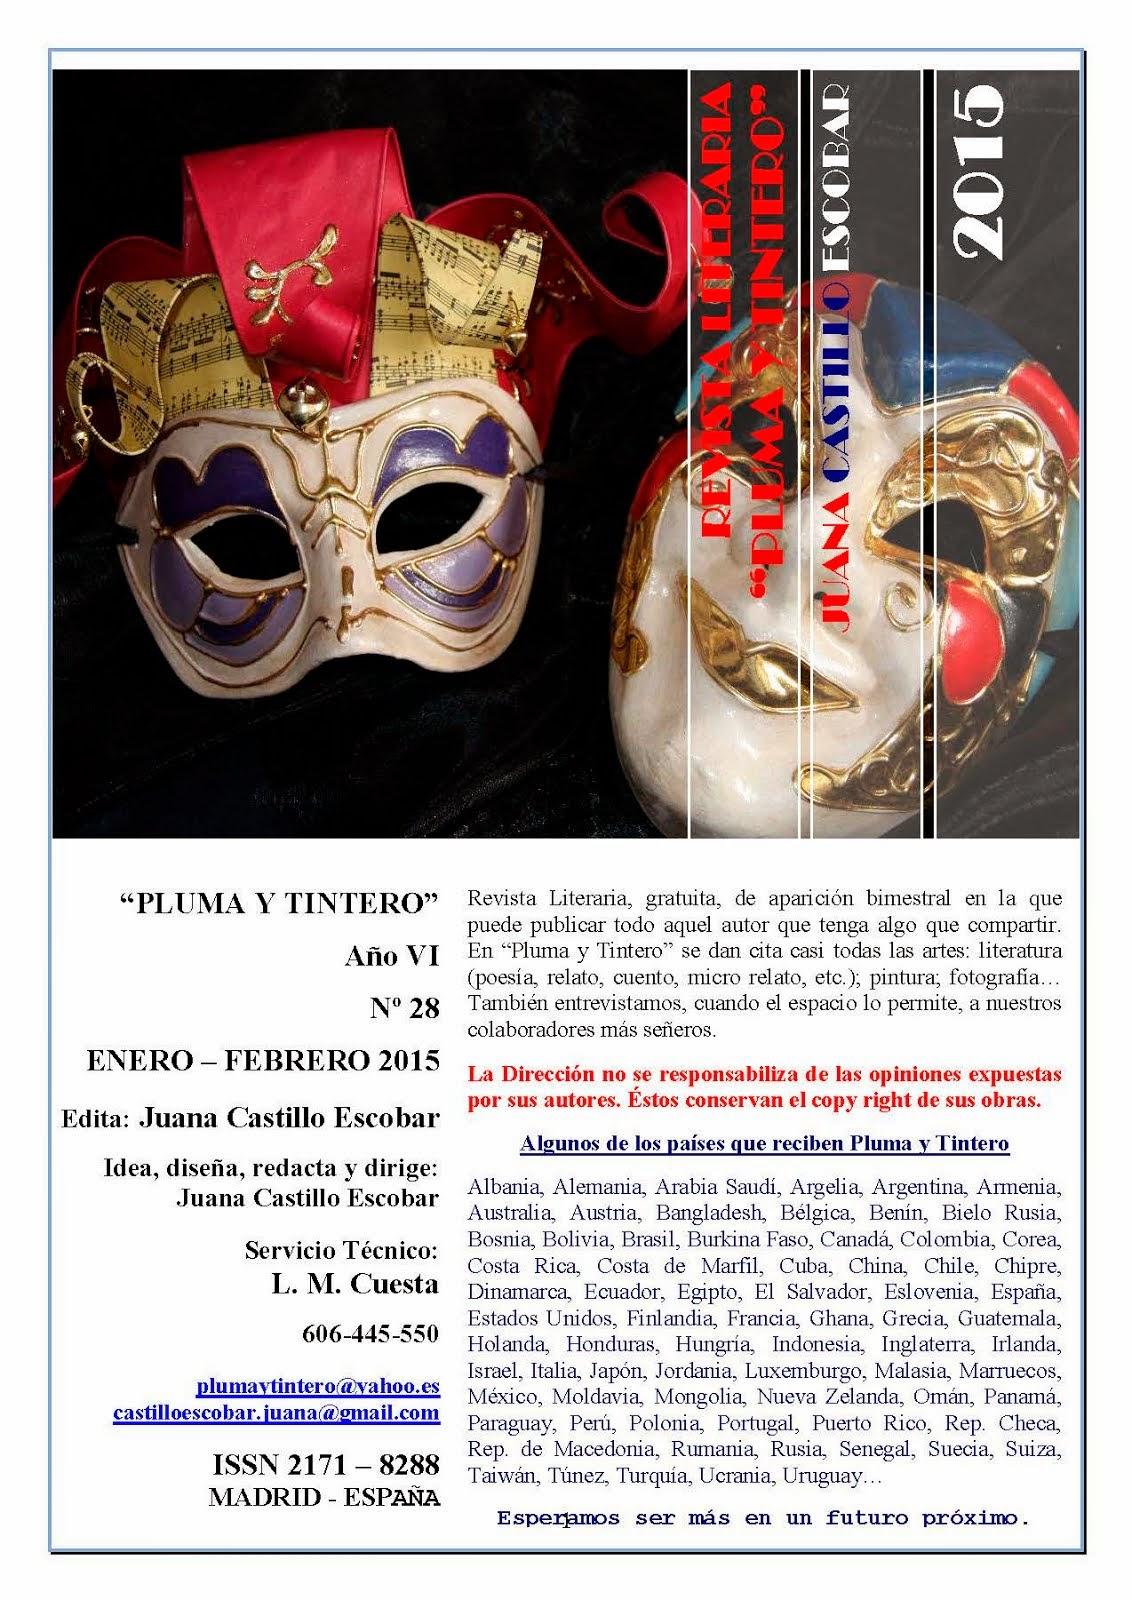 Nº 28 - Año VI - Enero-Febrero 2015